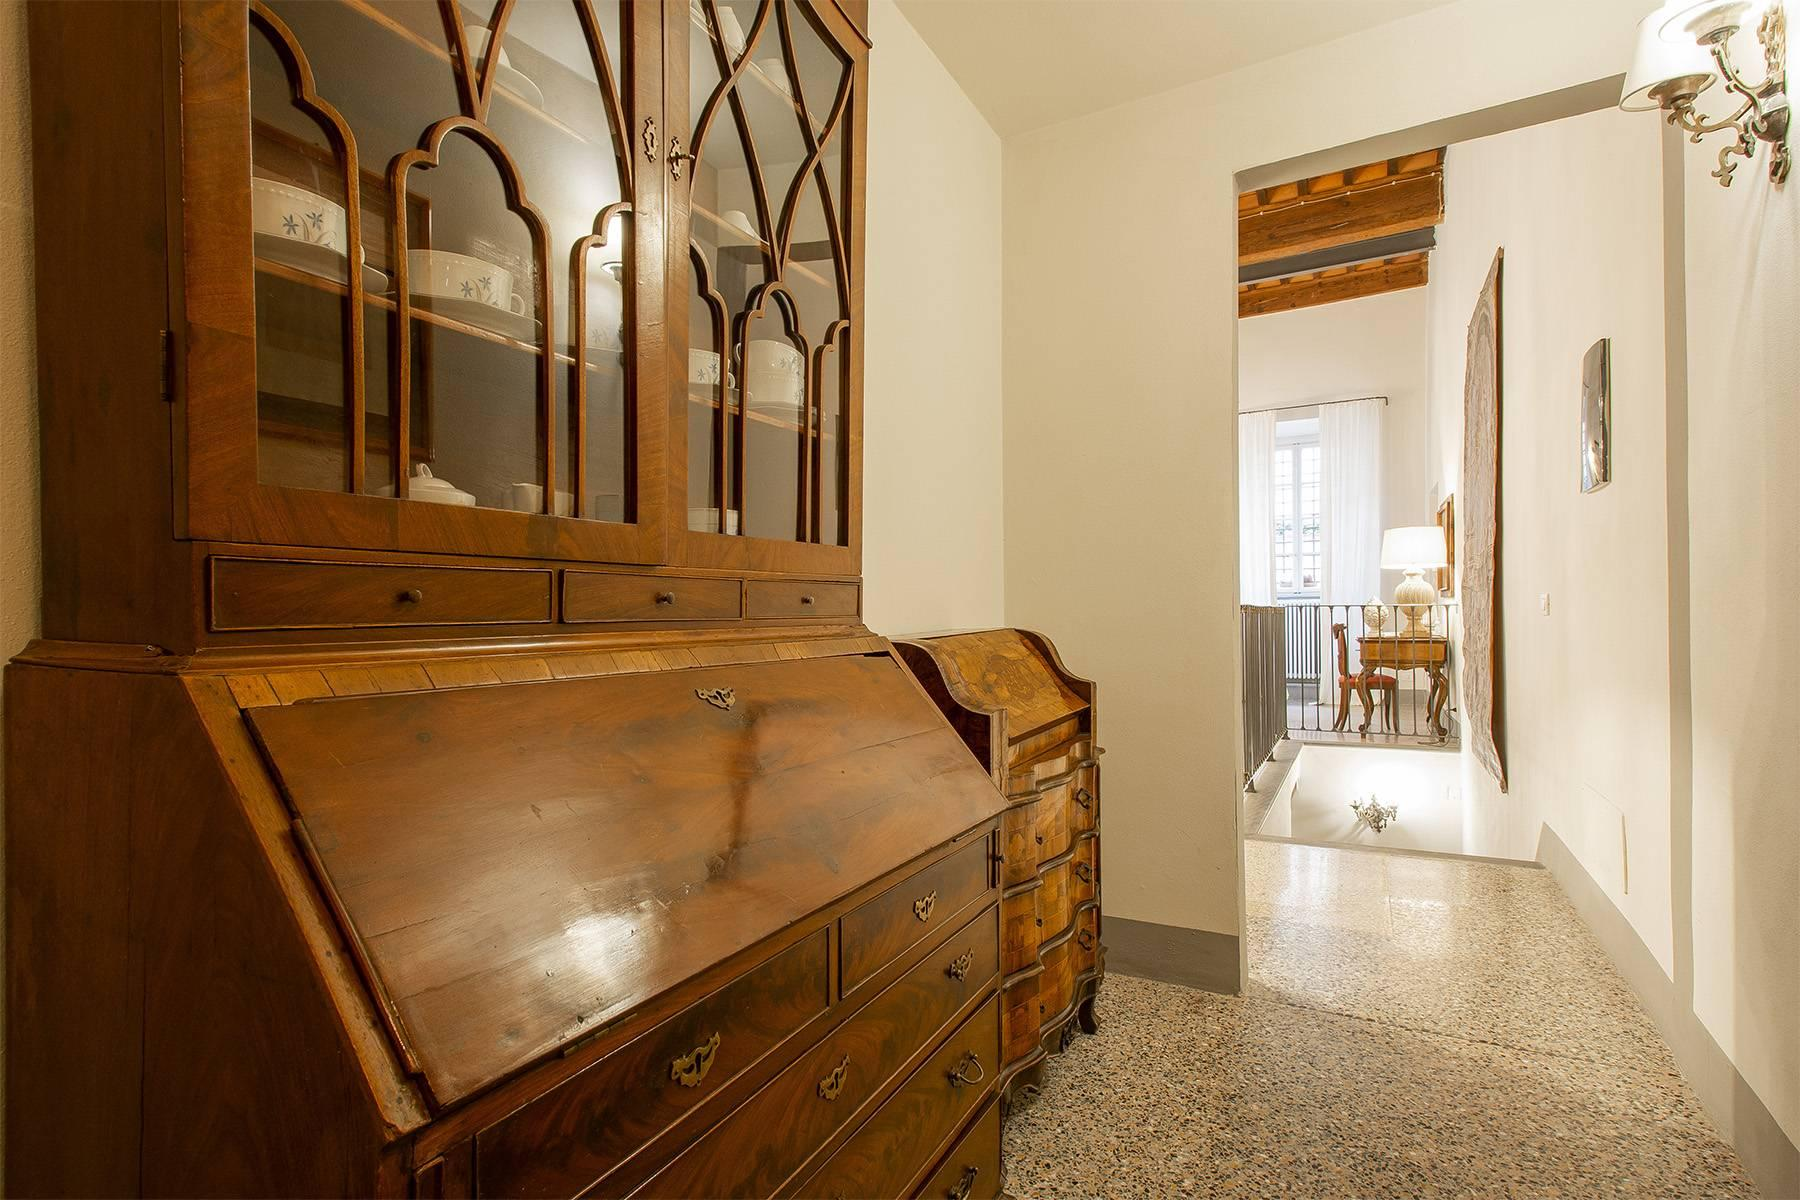 Appartement exclusif au coeur de Lucca - 23